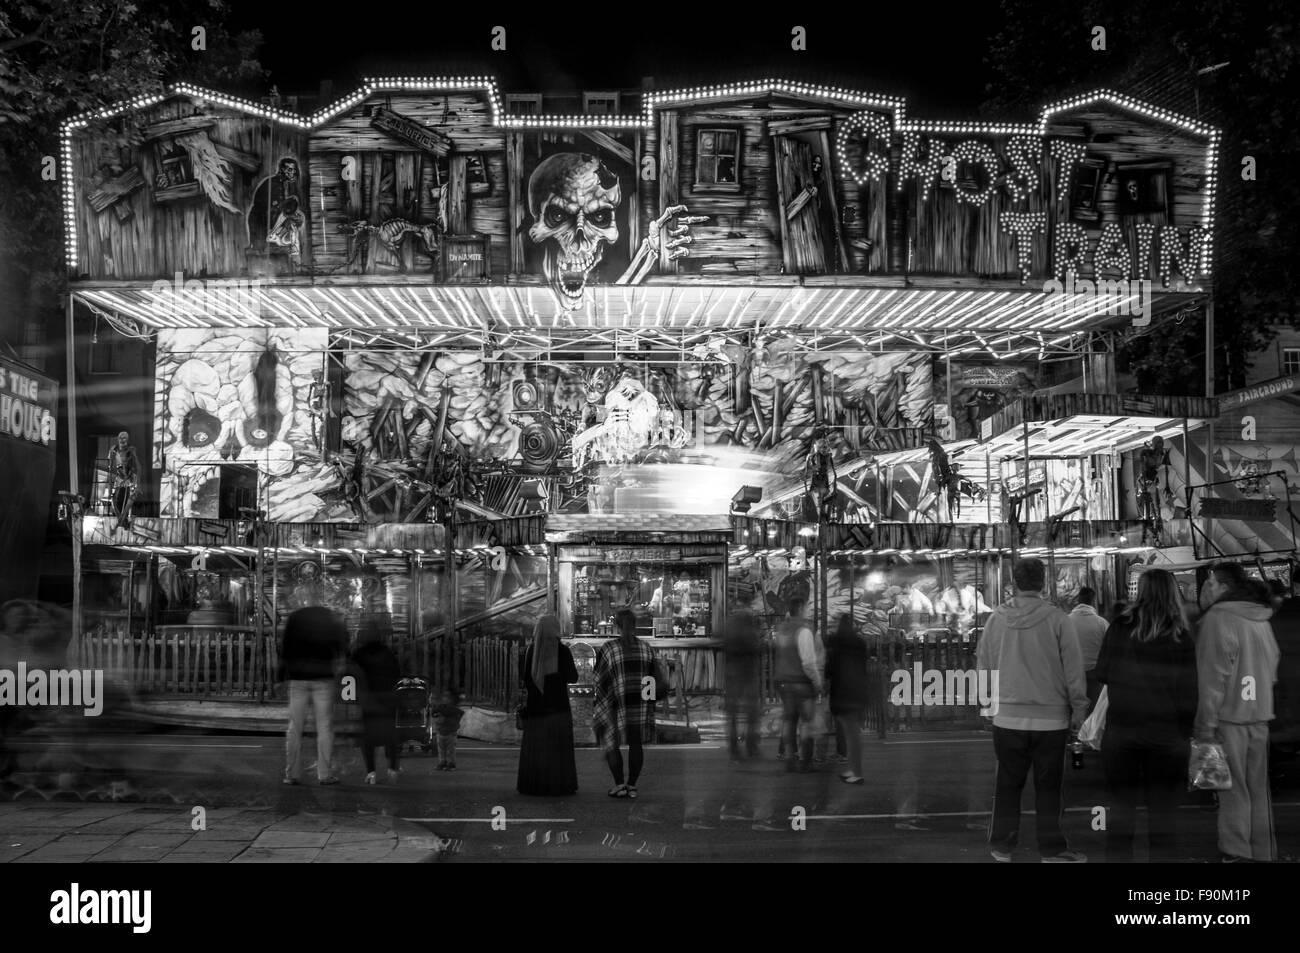 The St Giles Fair, Oxford, United Kingdom - Stock Image